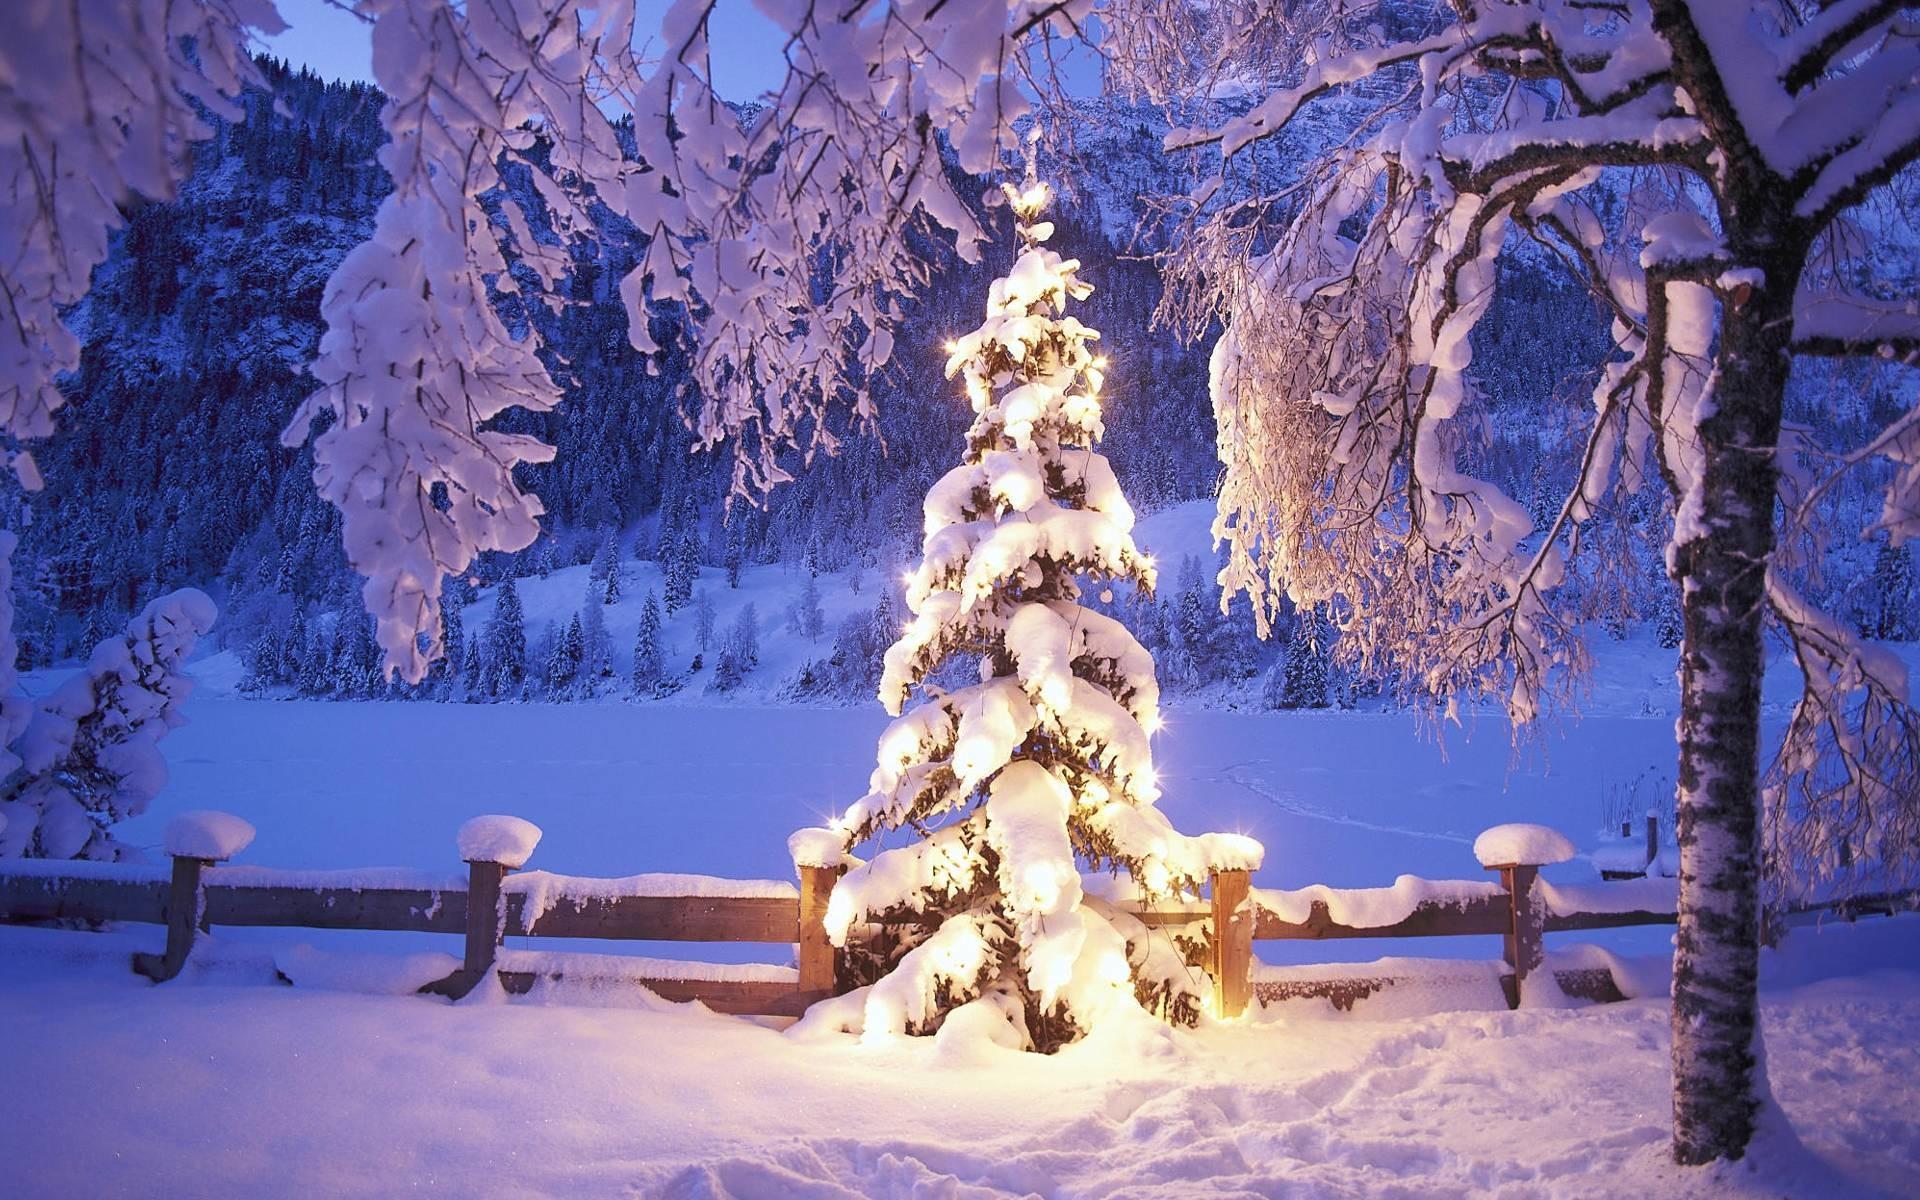 Winter Christmas Desktop Backgrounds (50+ images)